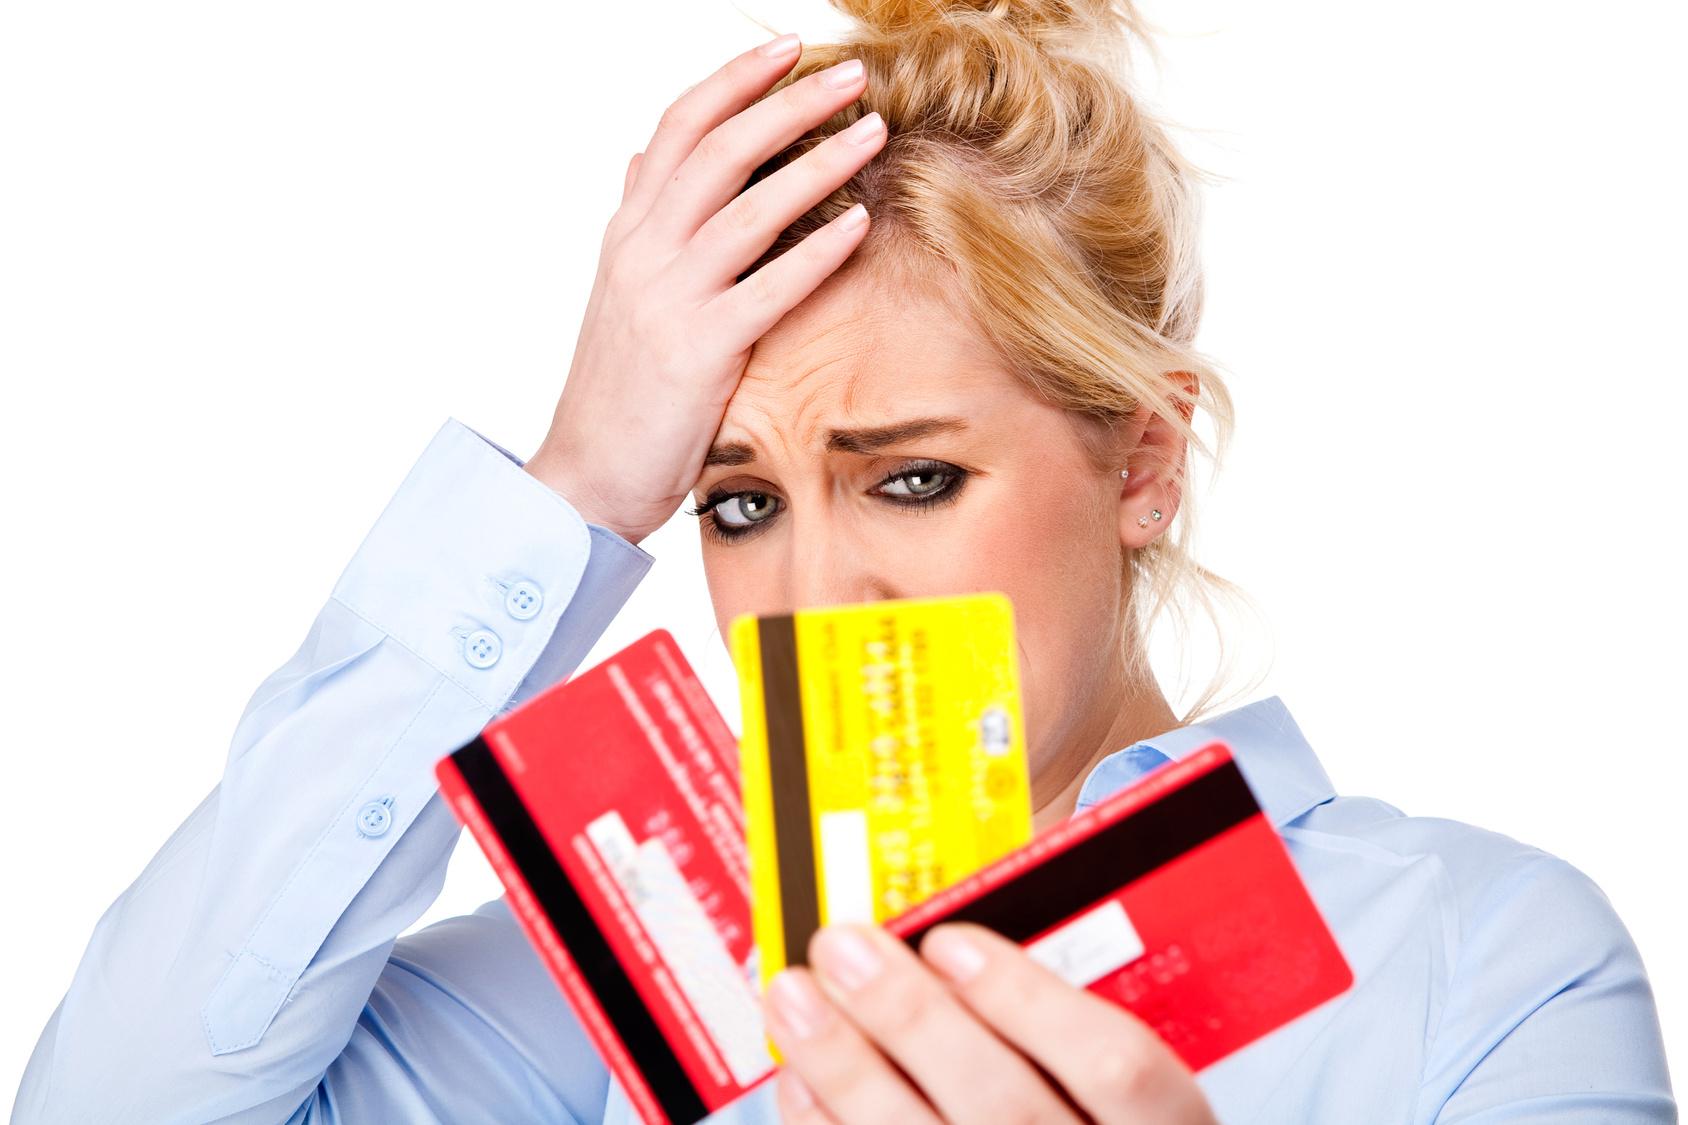 Девушка держит кредитки